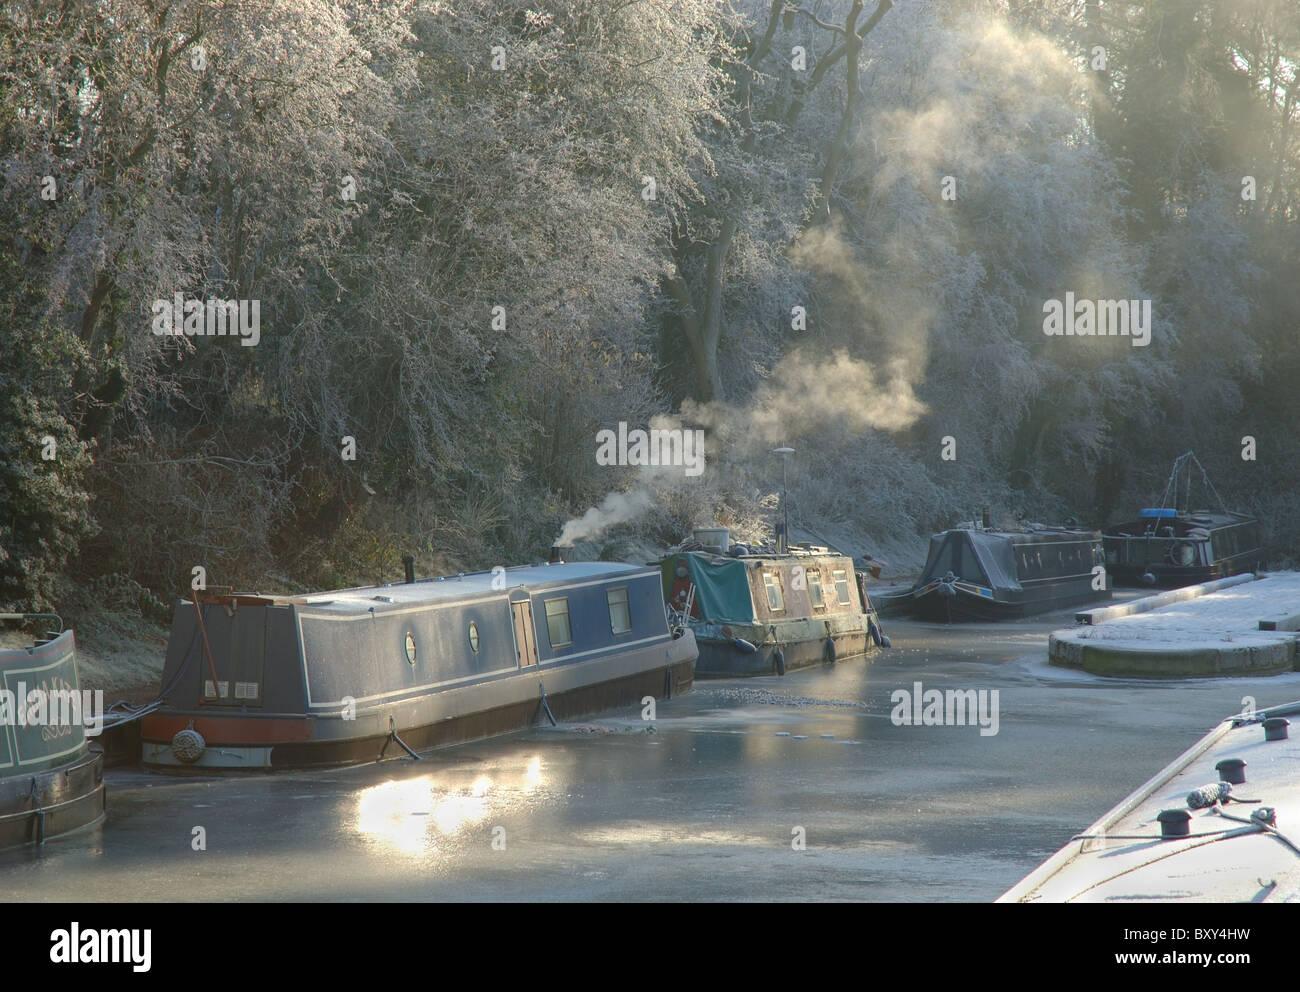 winter, Foxton Locks, Leicestershire, England, UK - Stock Image